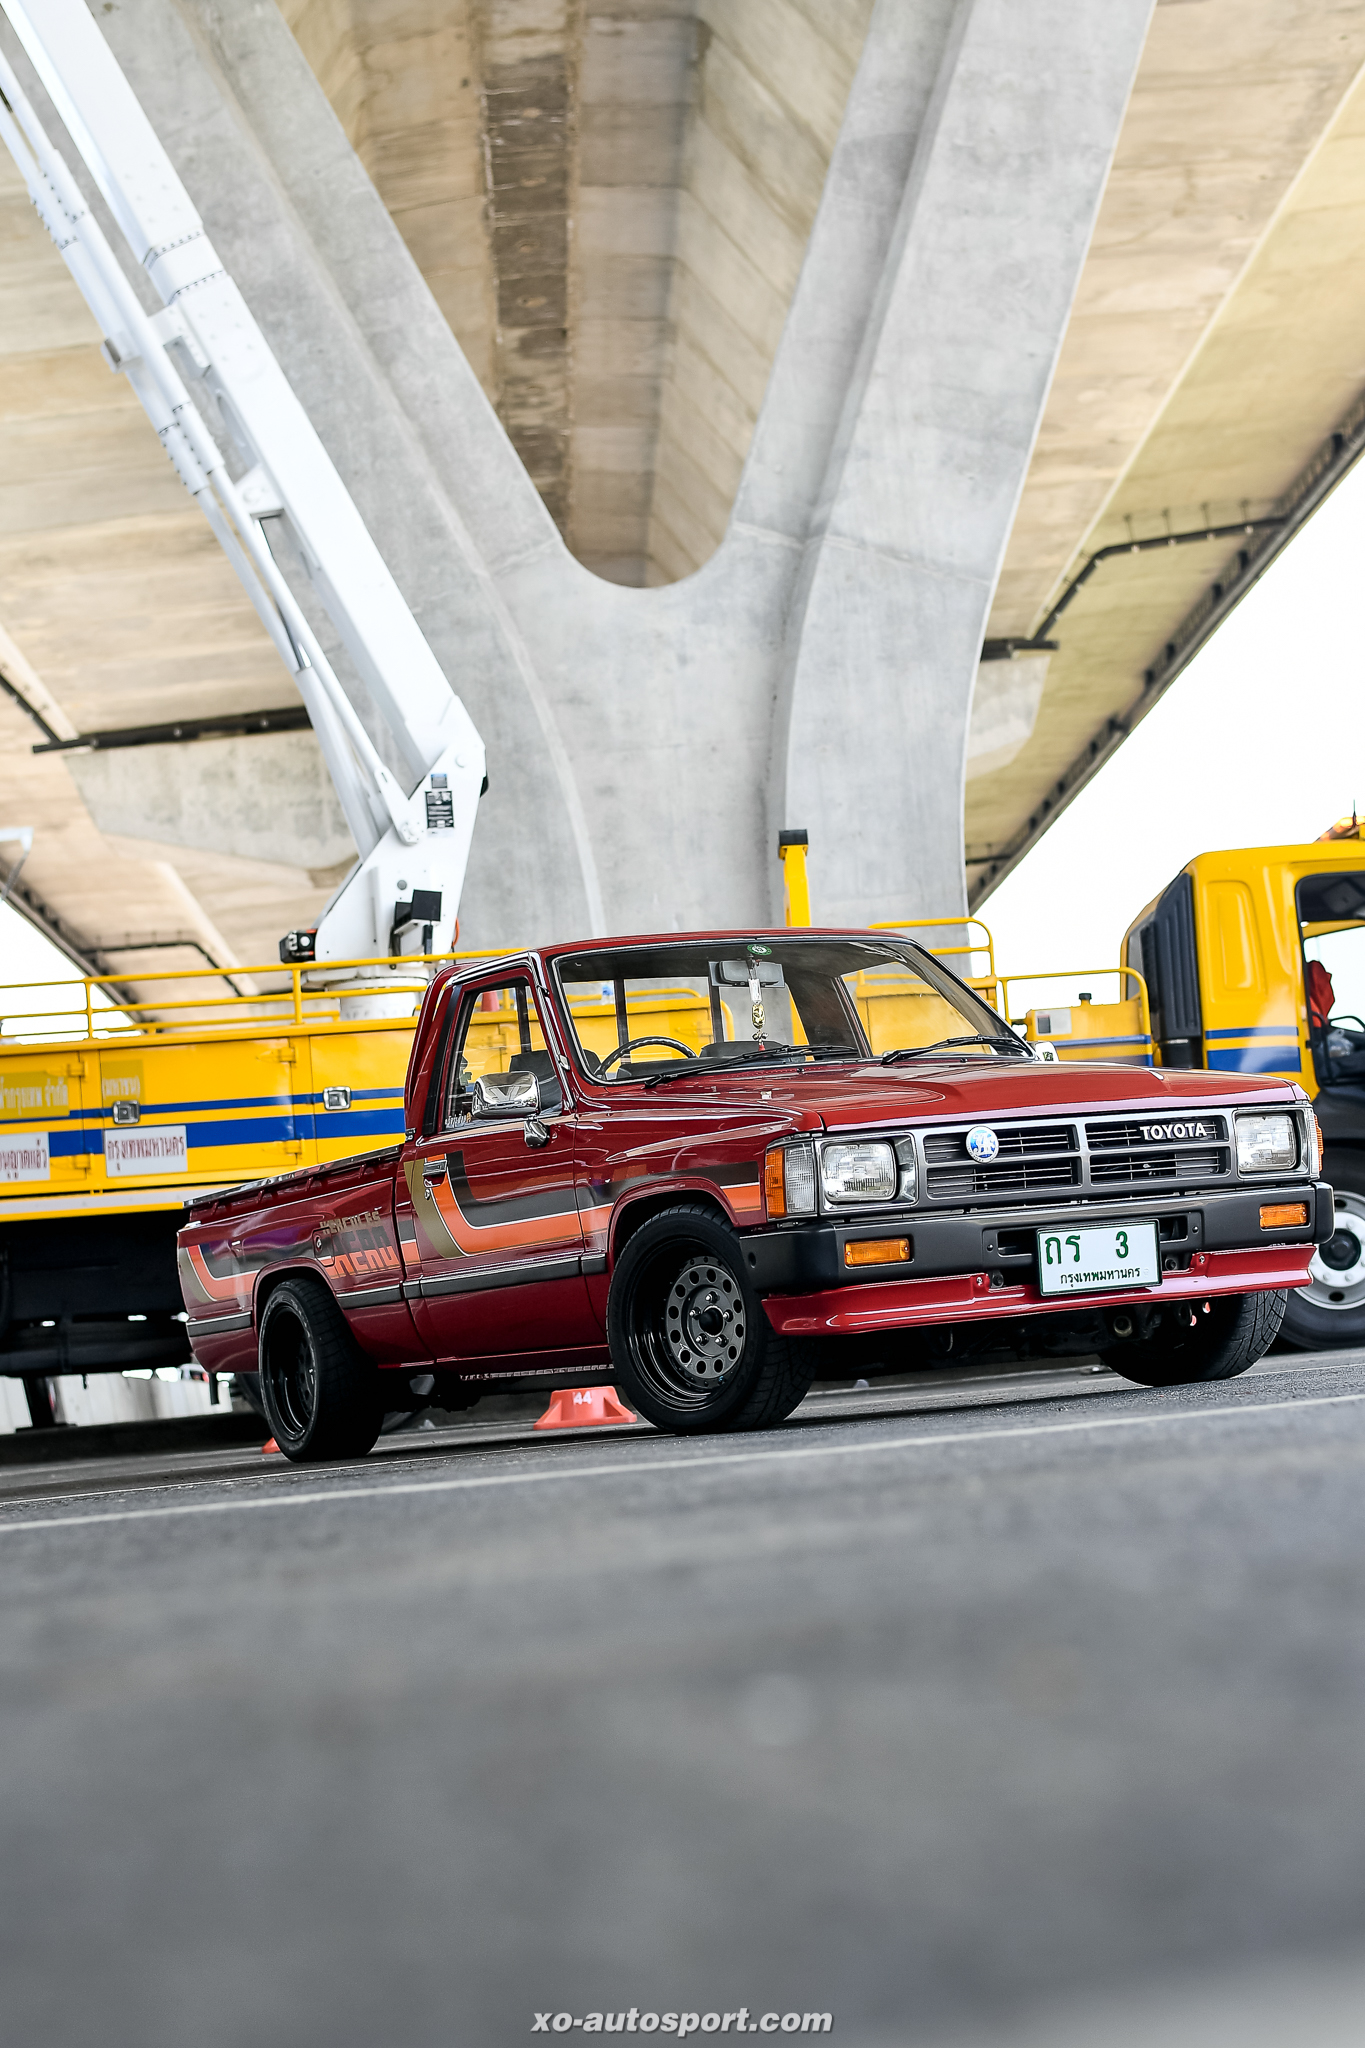 Short base truck 001